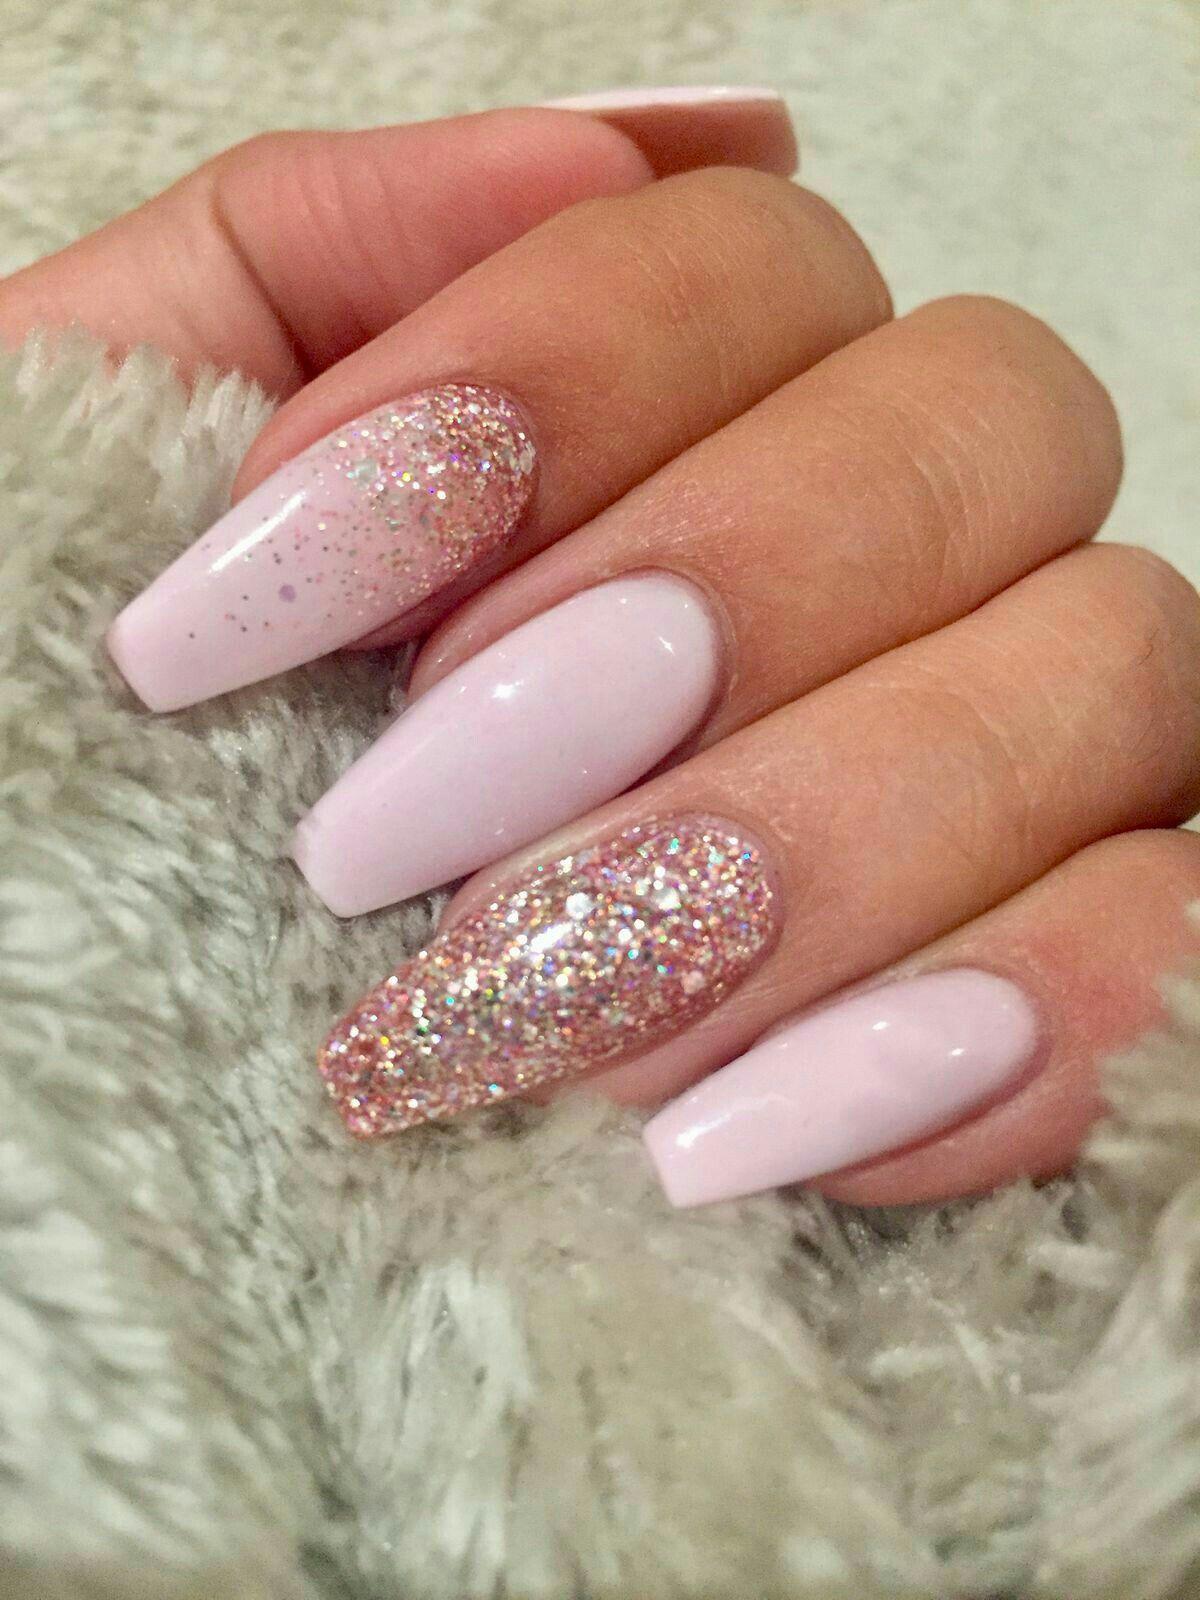 Pin By Savannah On Nails Light Pink Acrylic Nails Nails Design With Rhinestones Pretty Nail Designs Acrylics